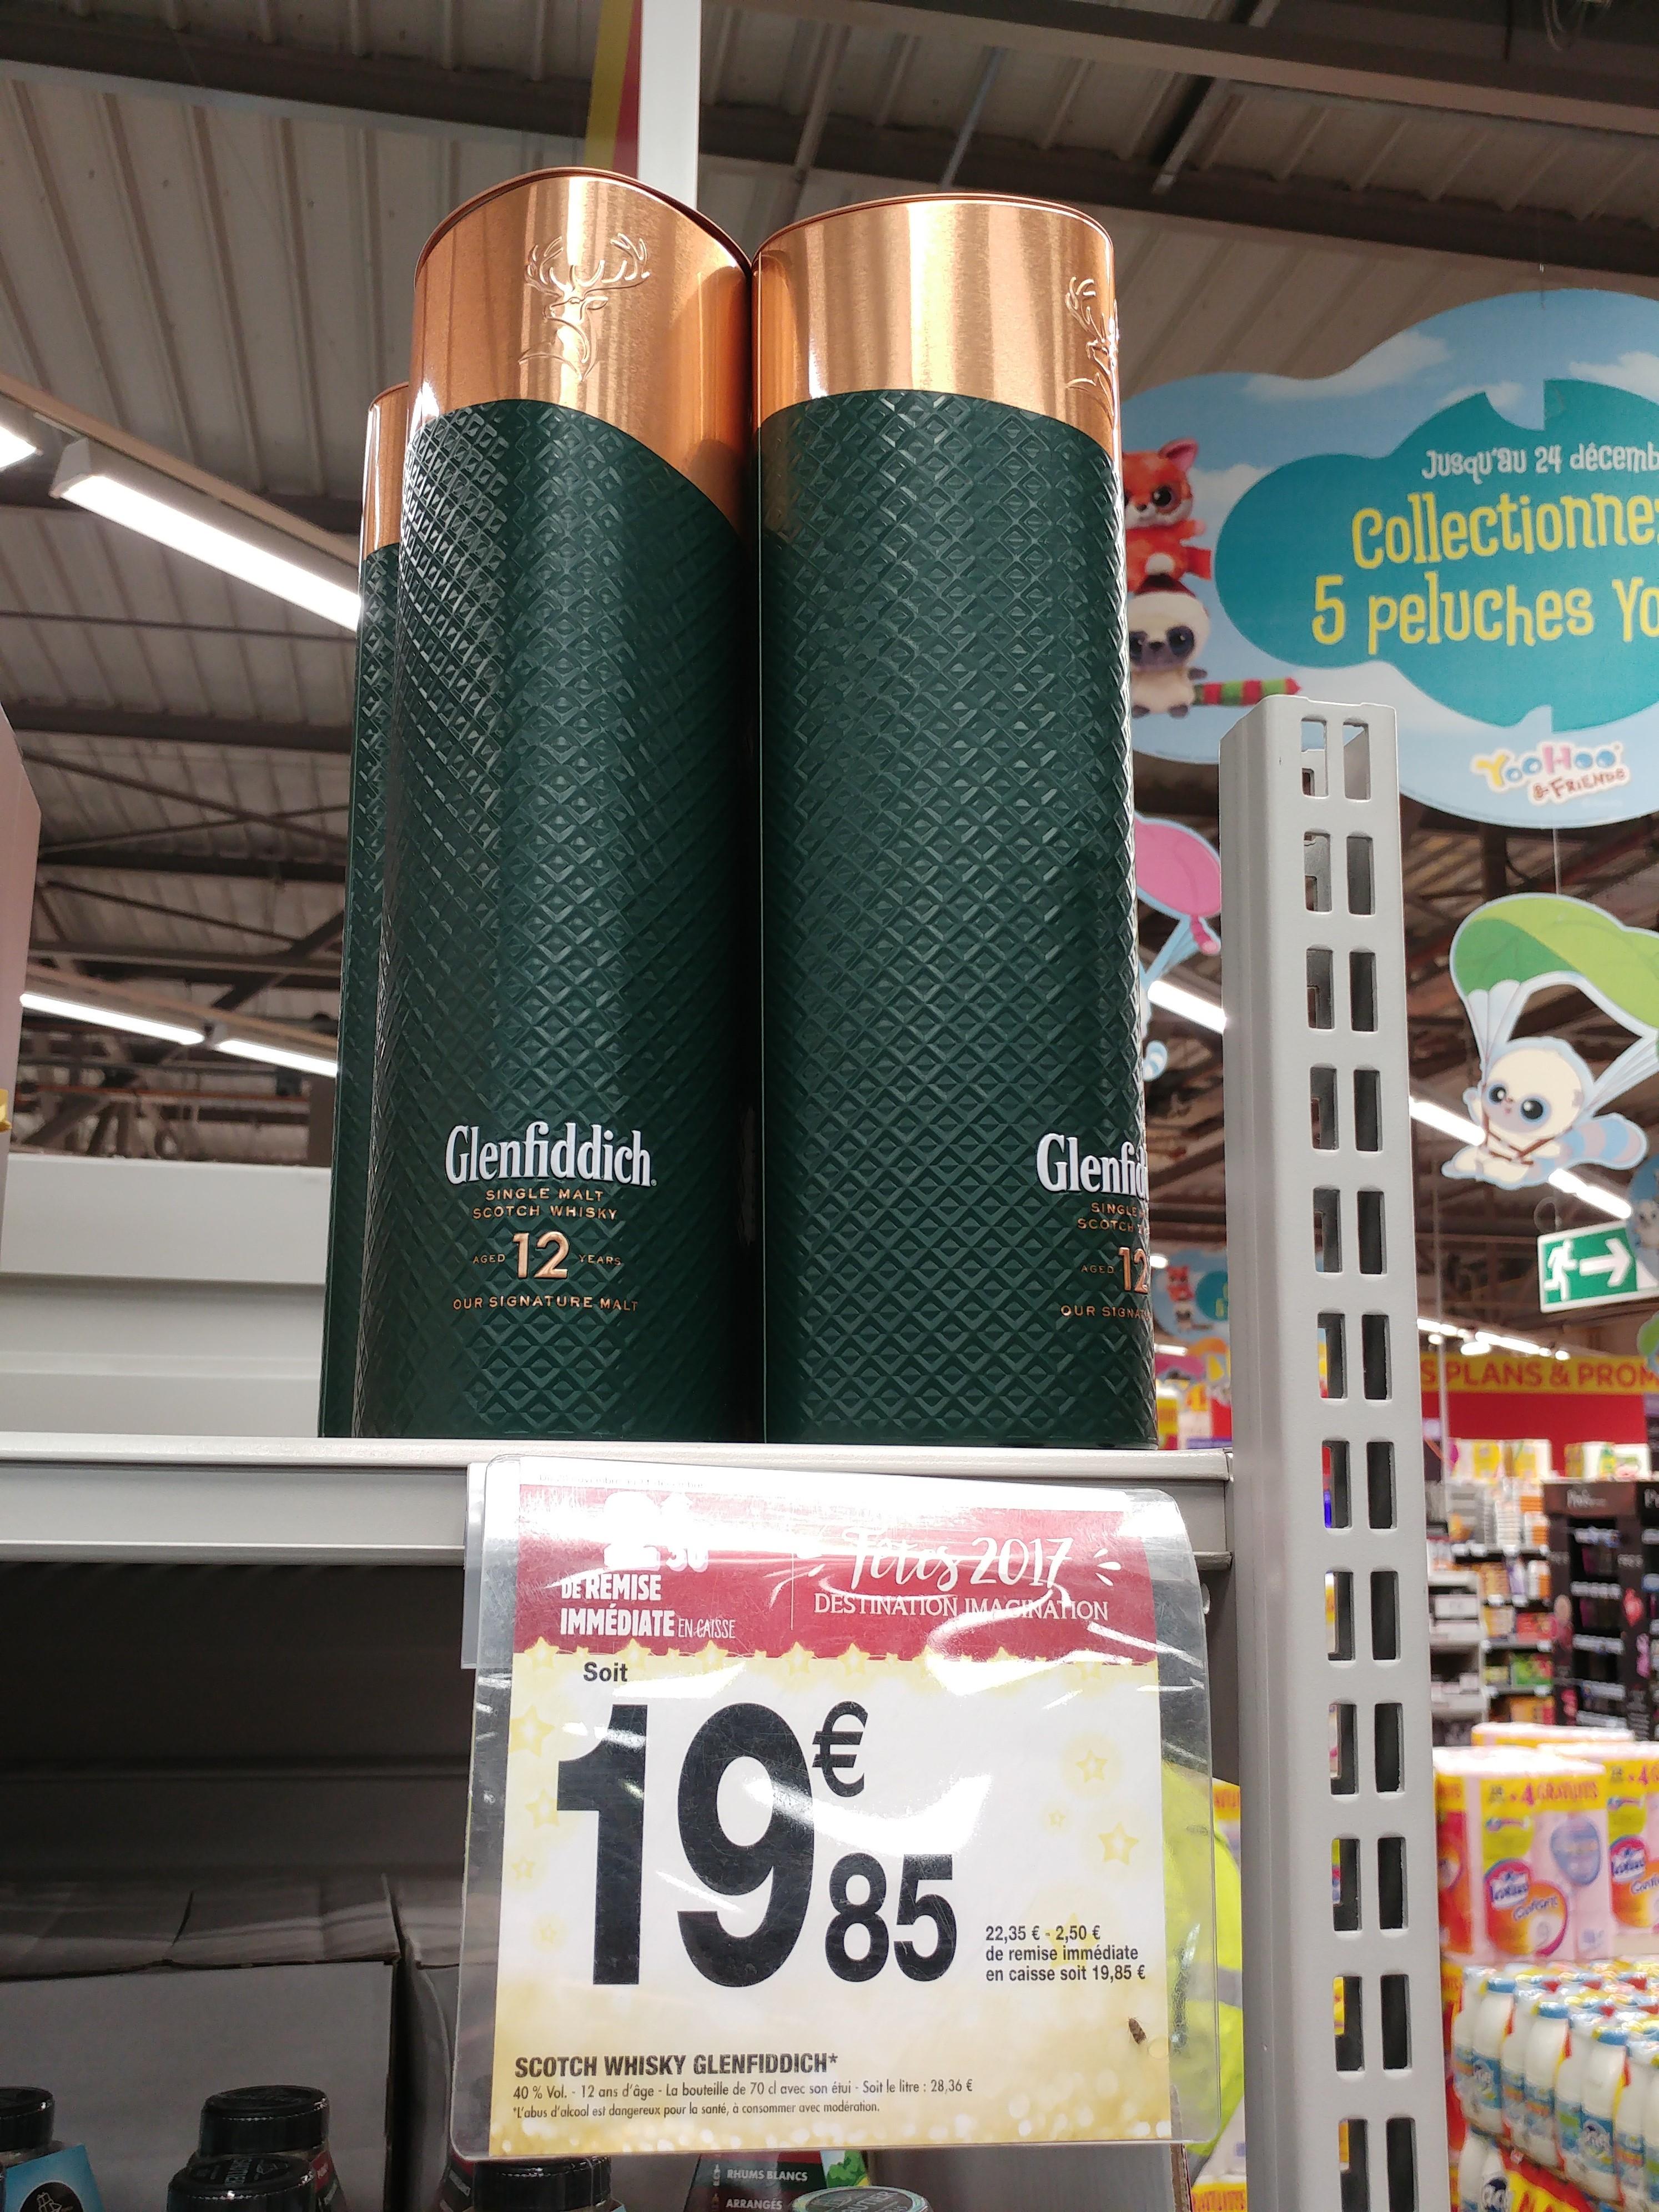 [ Grenzgänger ] Frankreich Carrefour div. Whiskys z.B. Glenfiddich 12, Cardhu, Aberlour,  Glenmorangie